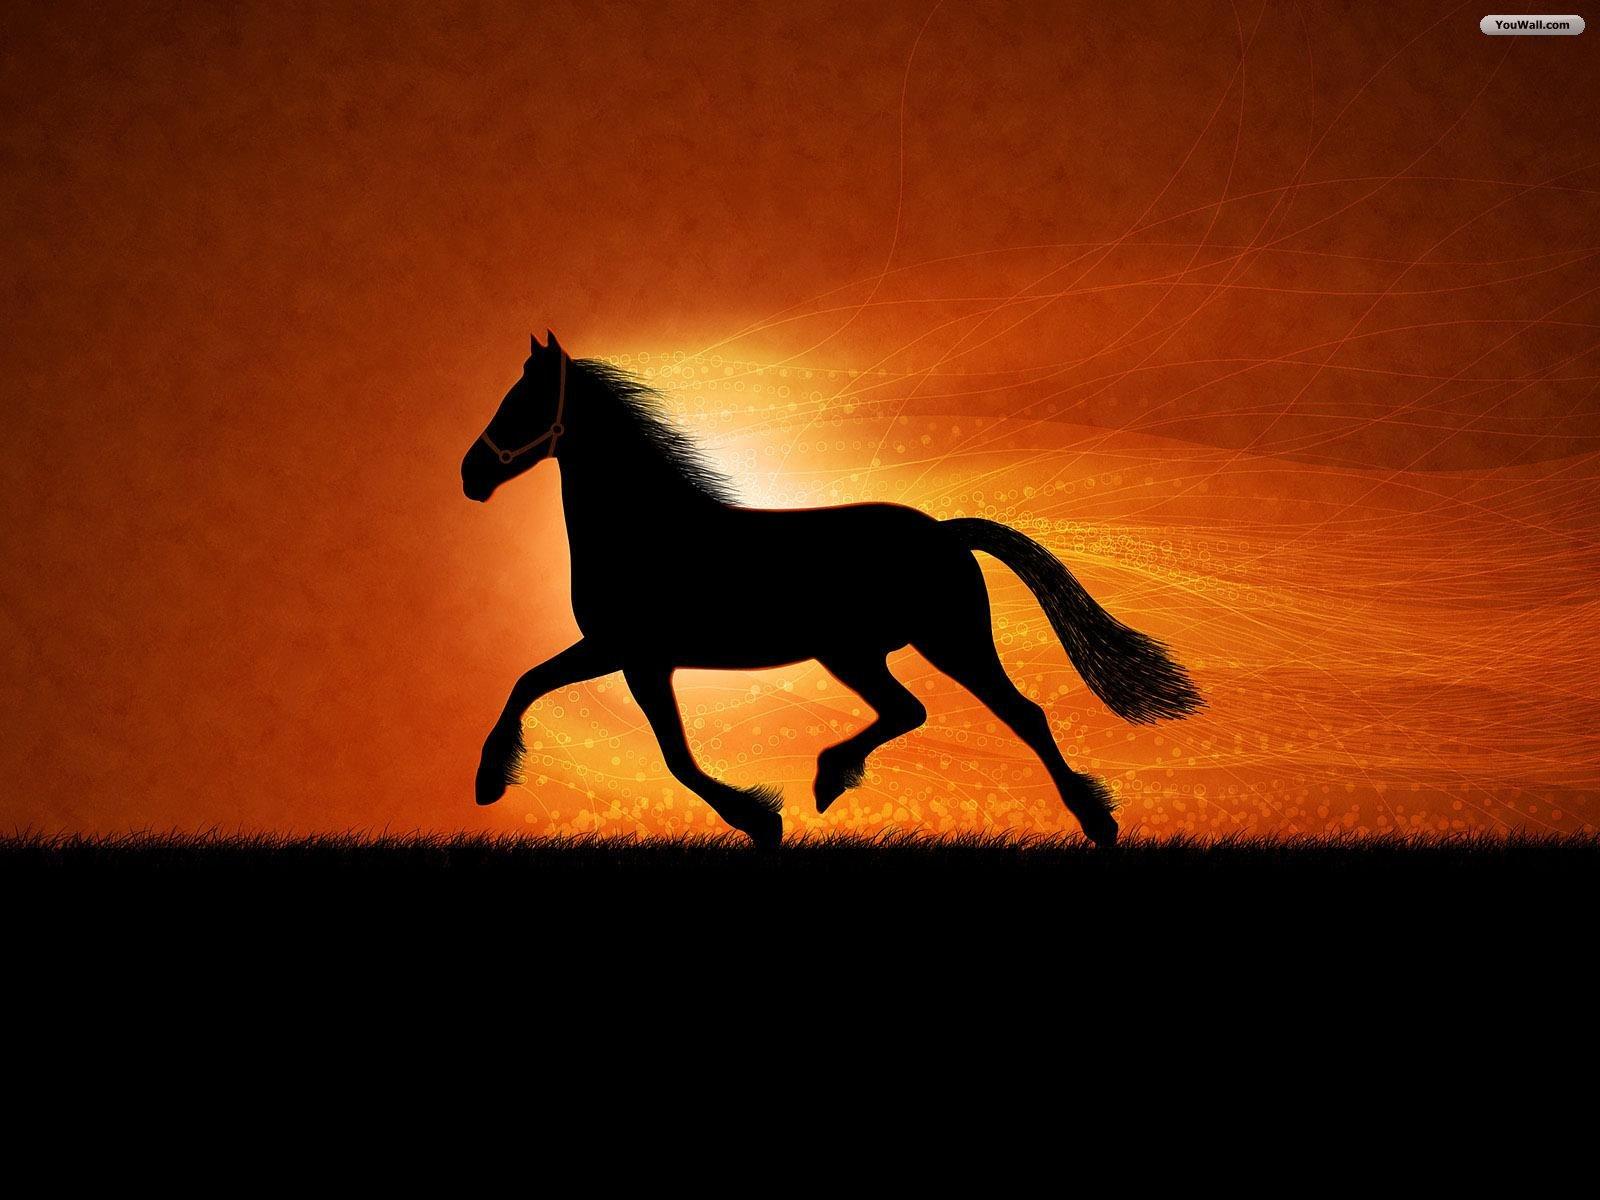 http://2.bp.blogspot.com/-Ts1cx1hlXf0/TWs9iGDERcI/AAAAAAAASiw/vK6rS8ambOU/s1600/black_horse_wallpaper.jpg